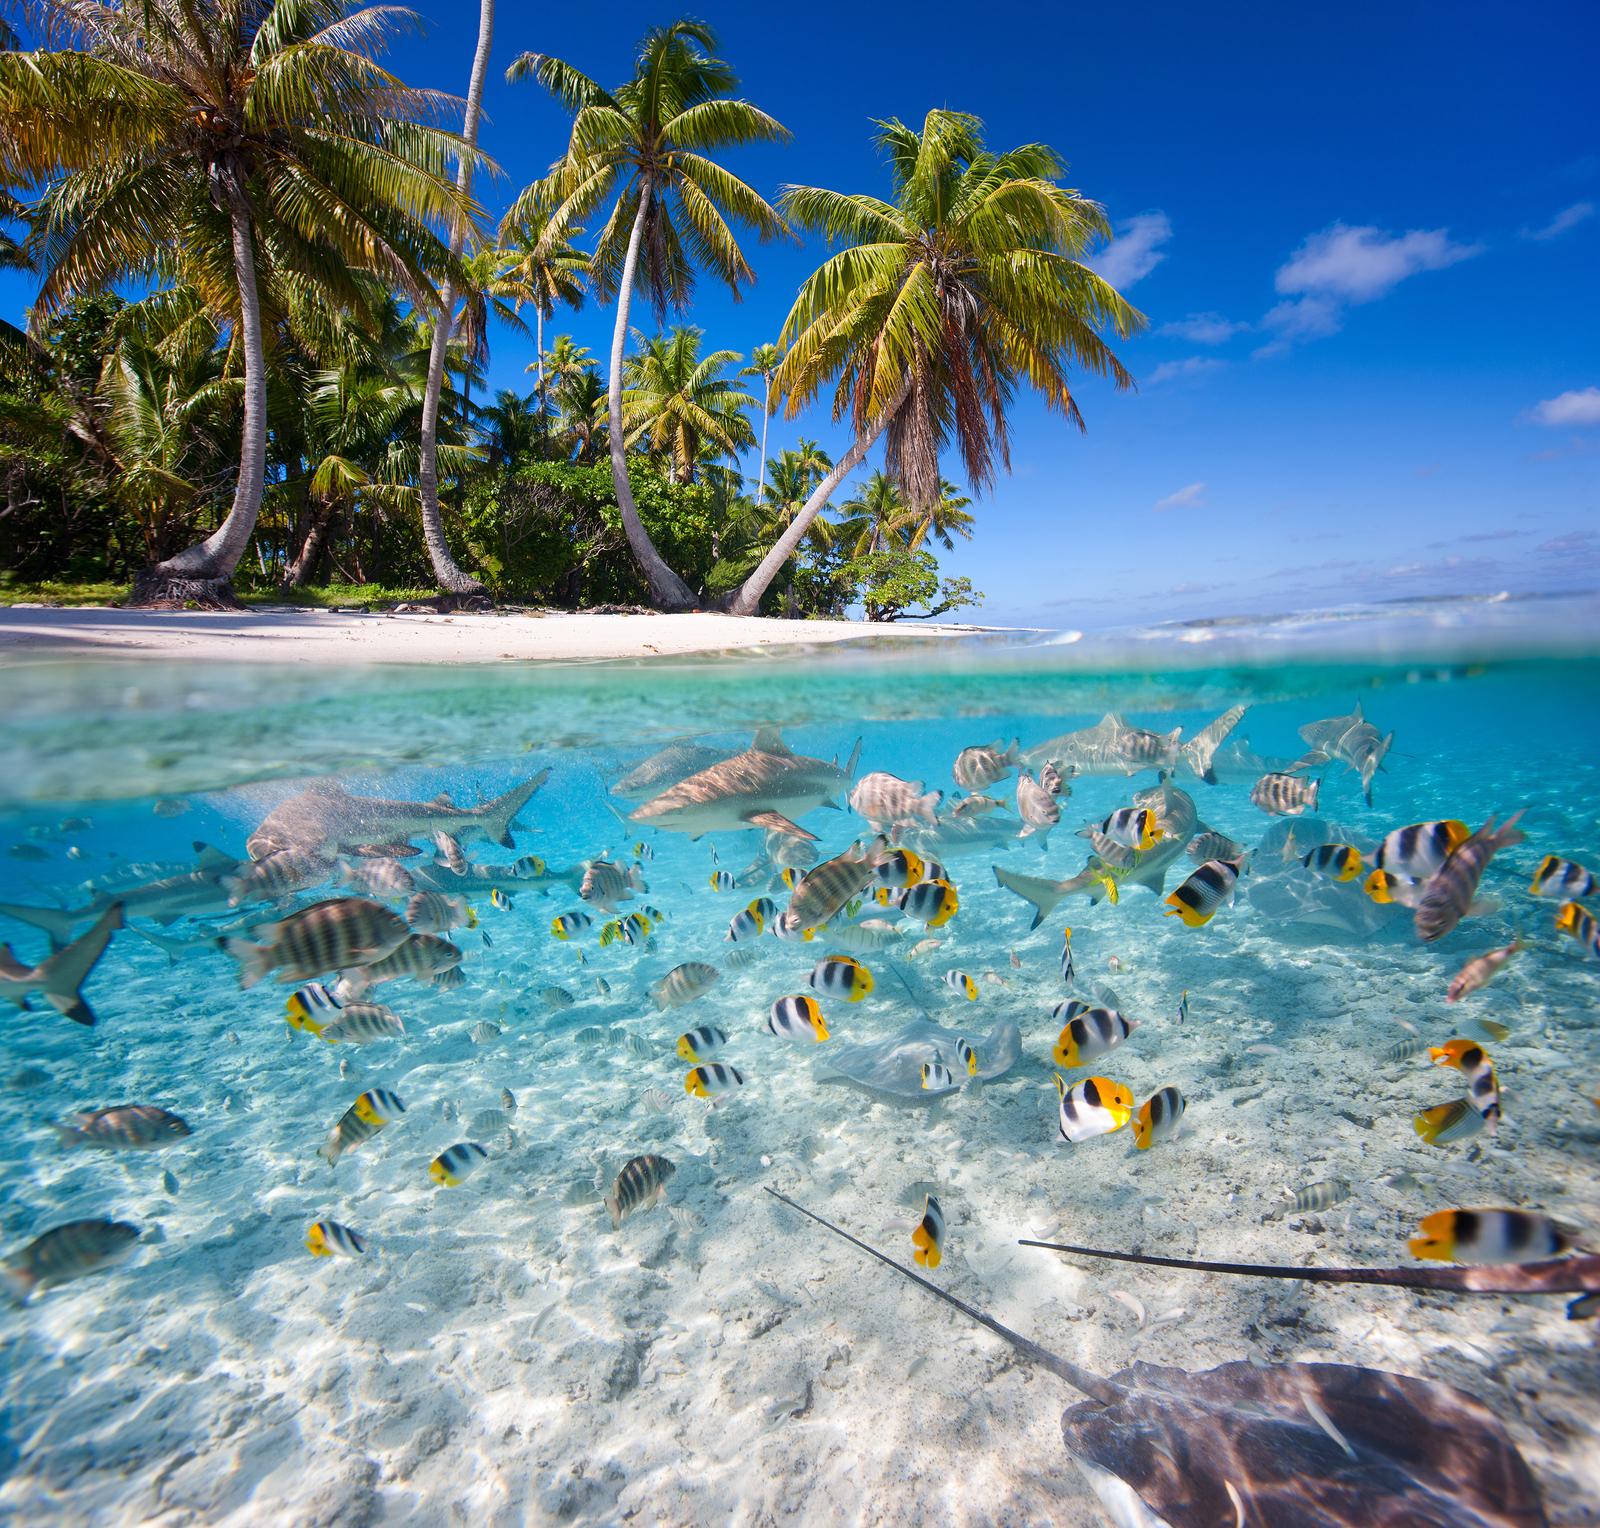 bigstock-Beautiful-tropical-island-unde-59267531.jpg